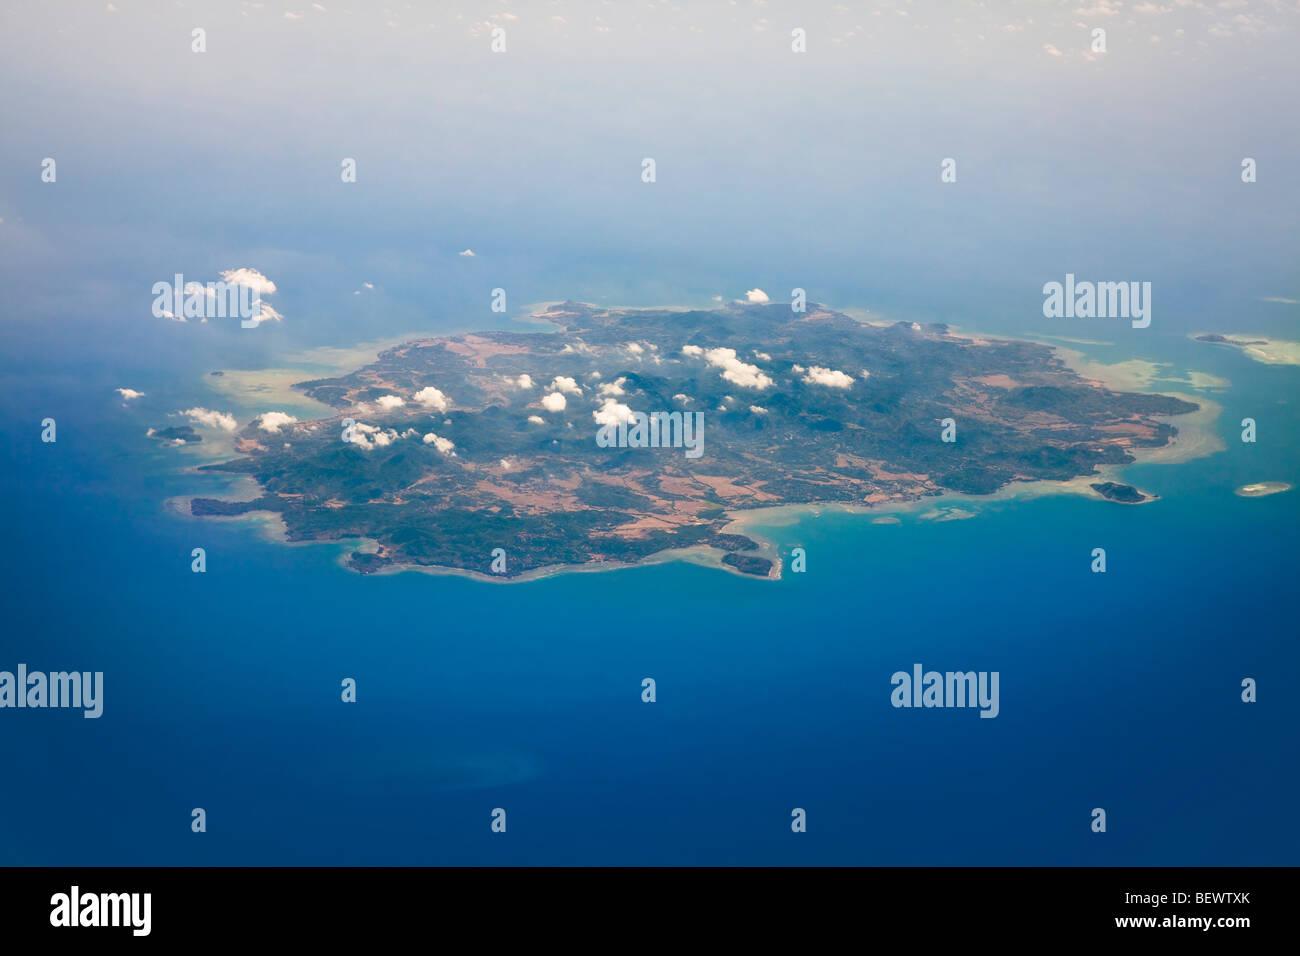 Aerial view of Pulau Bawean Island, East Java, Indonesia - Stock Image